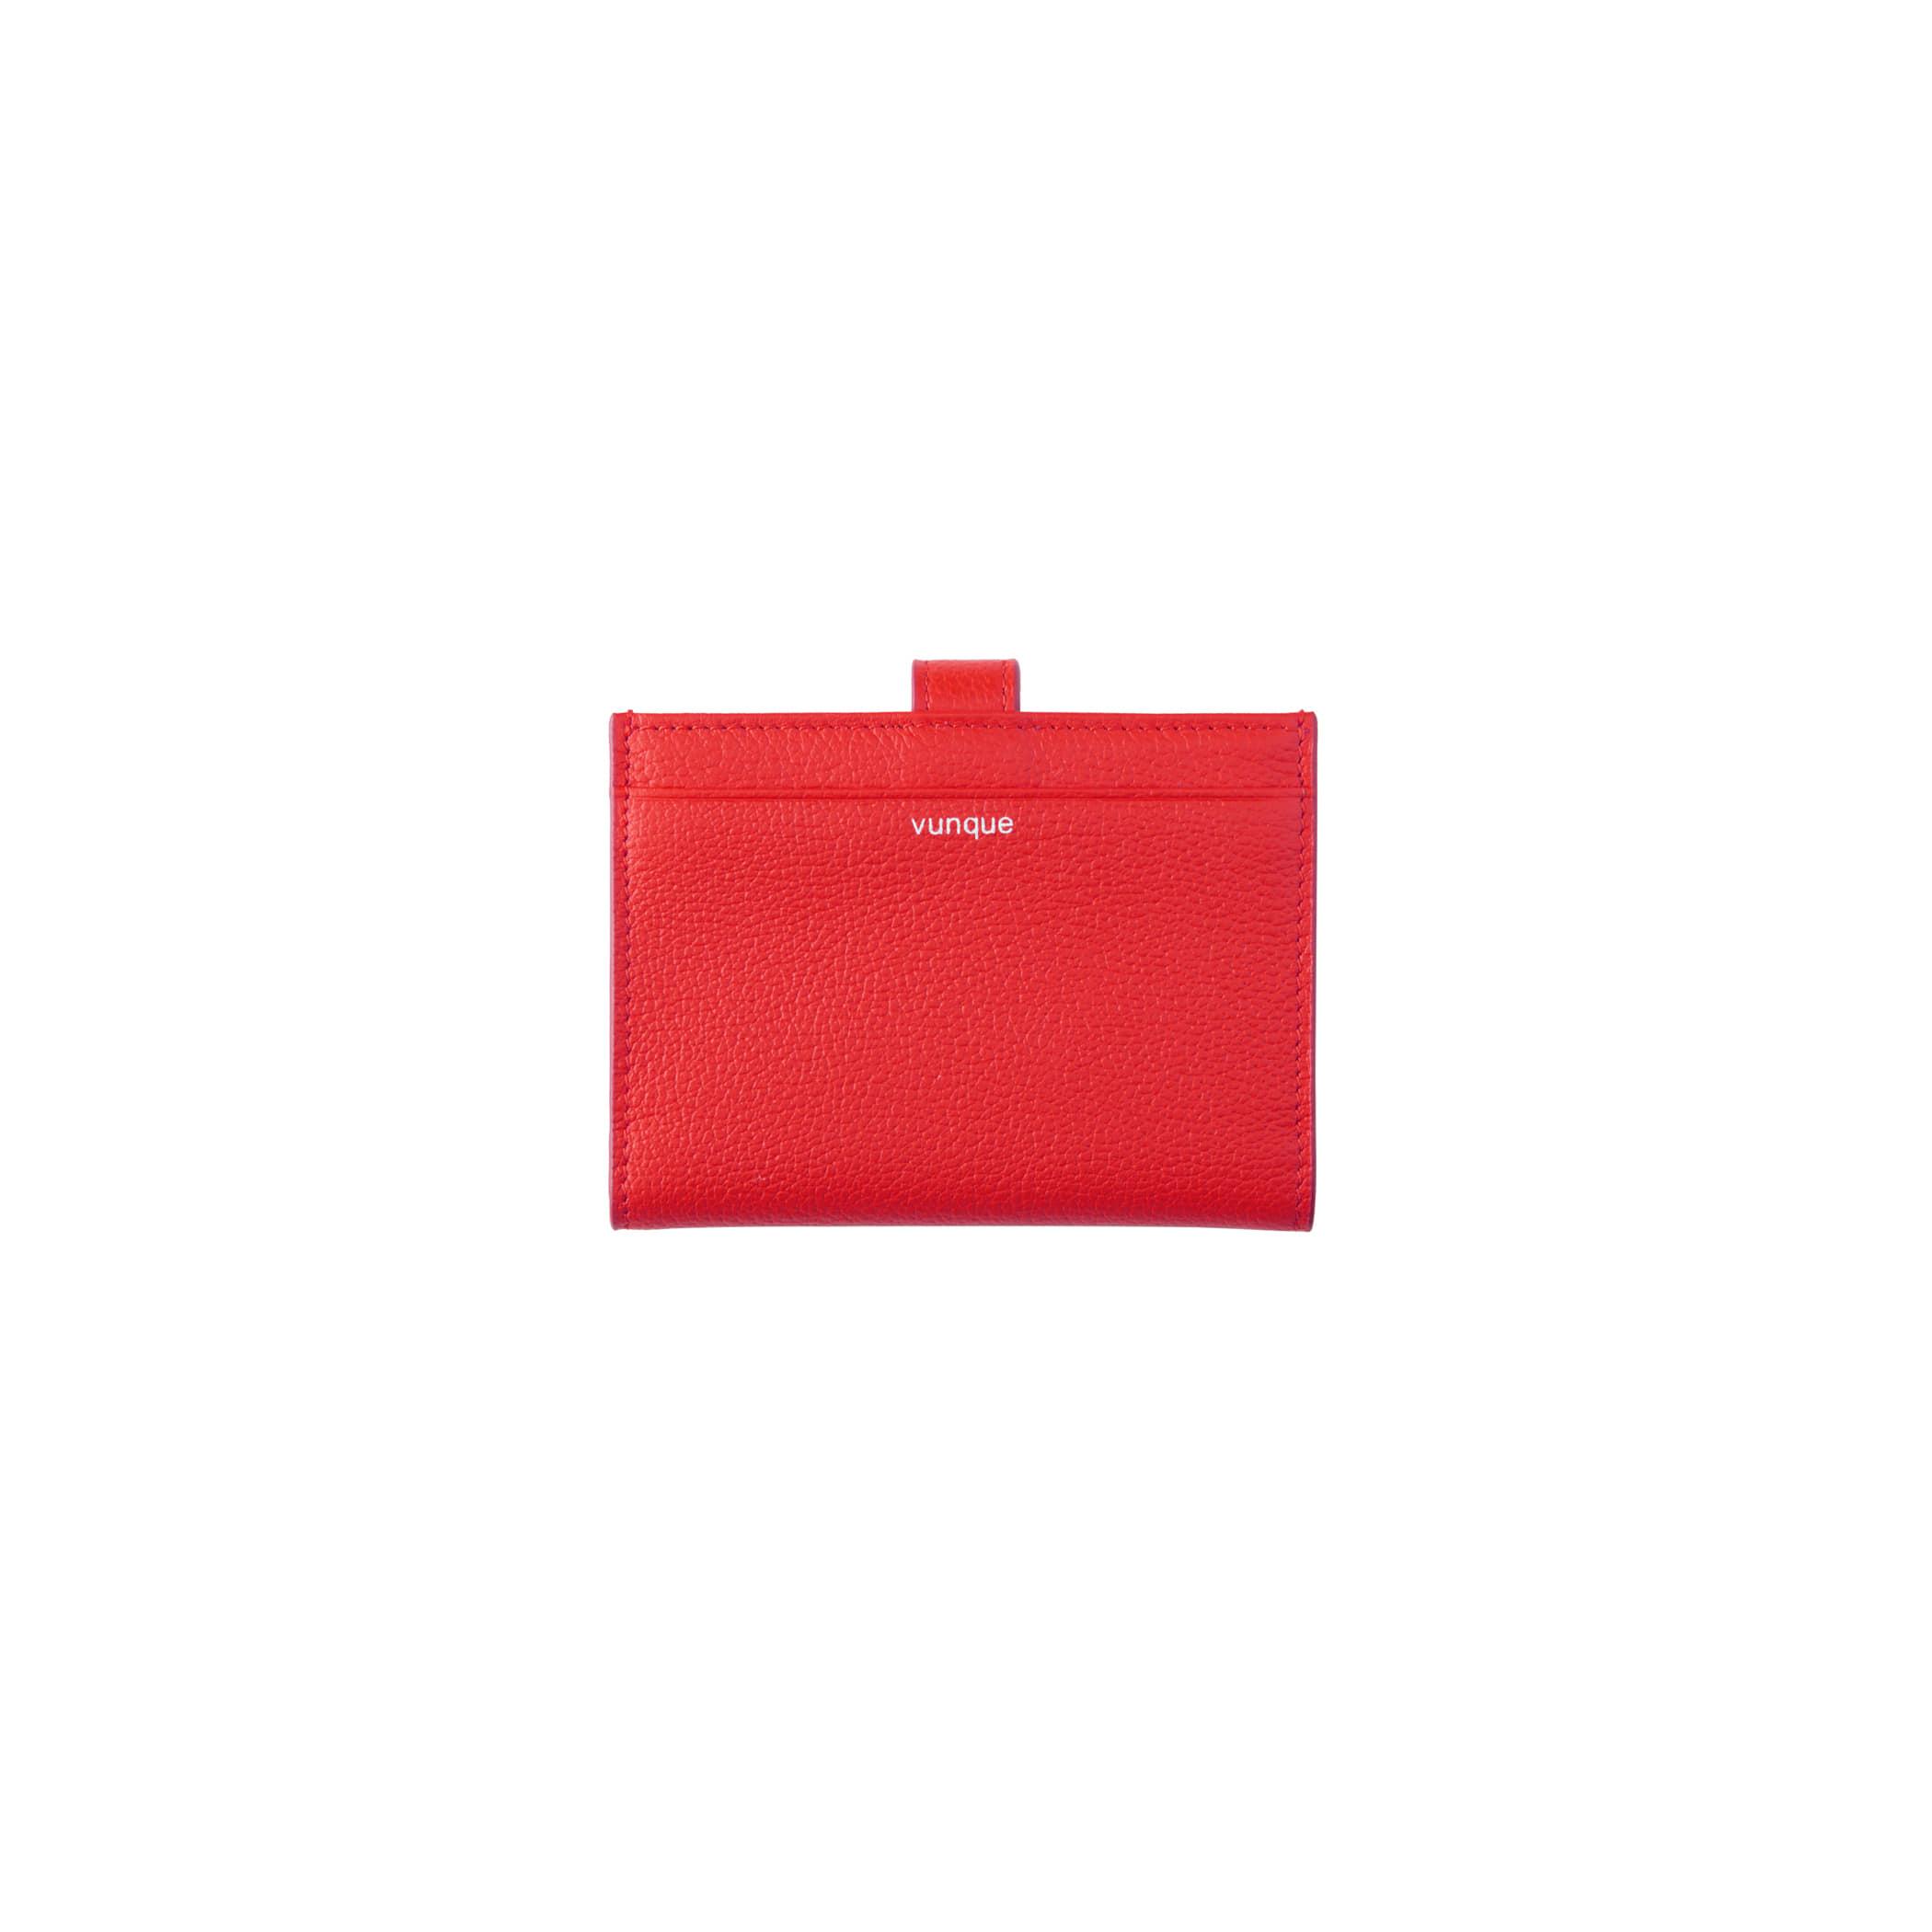 Magpie Card wallet (맥파이 카드지갑) Red